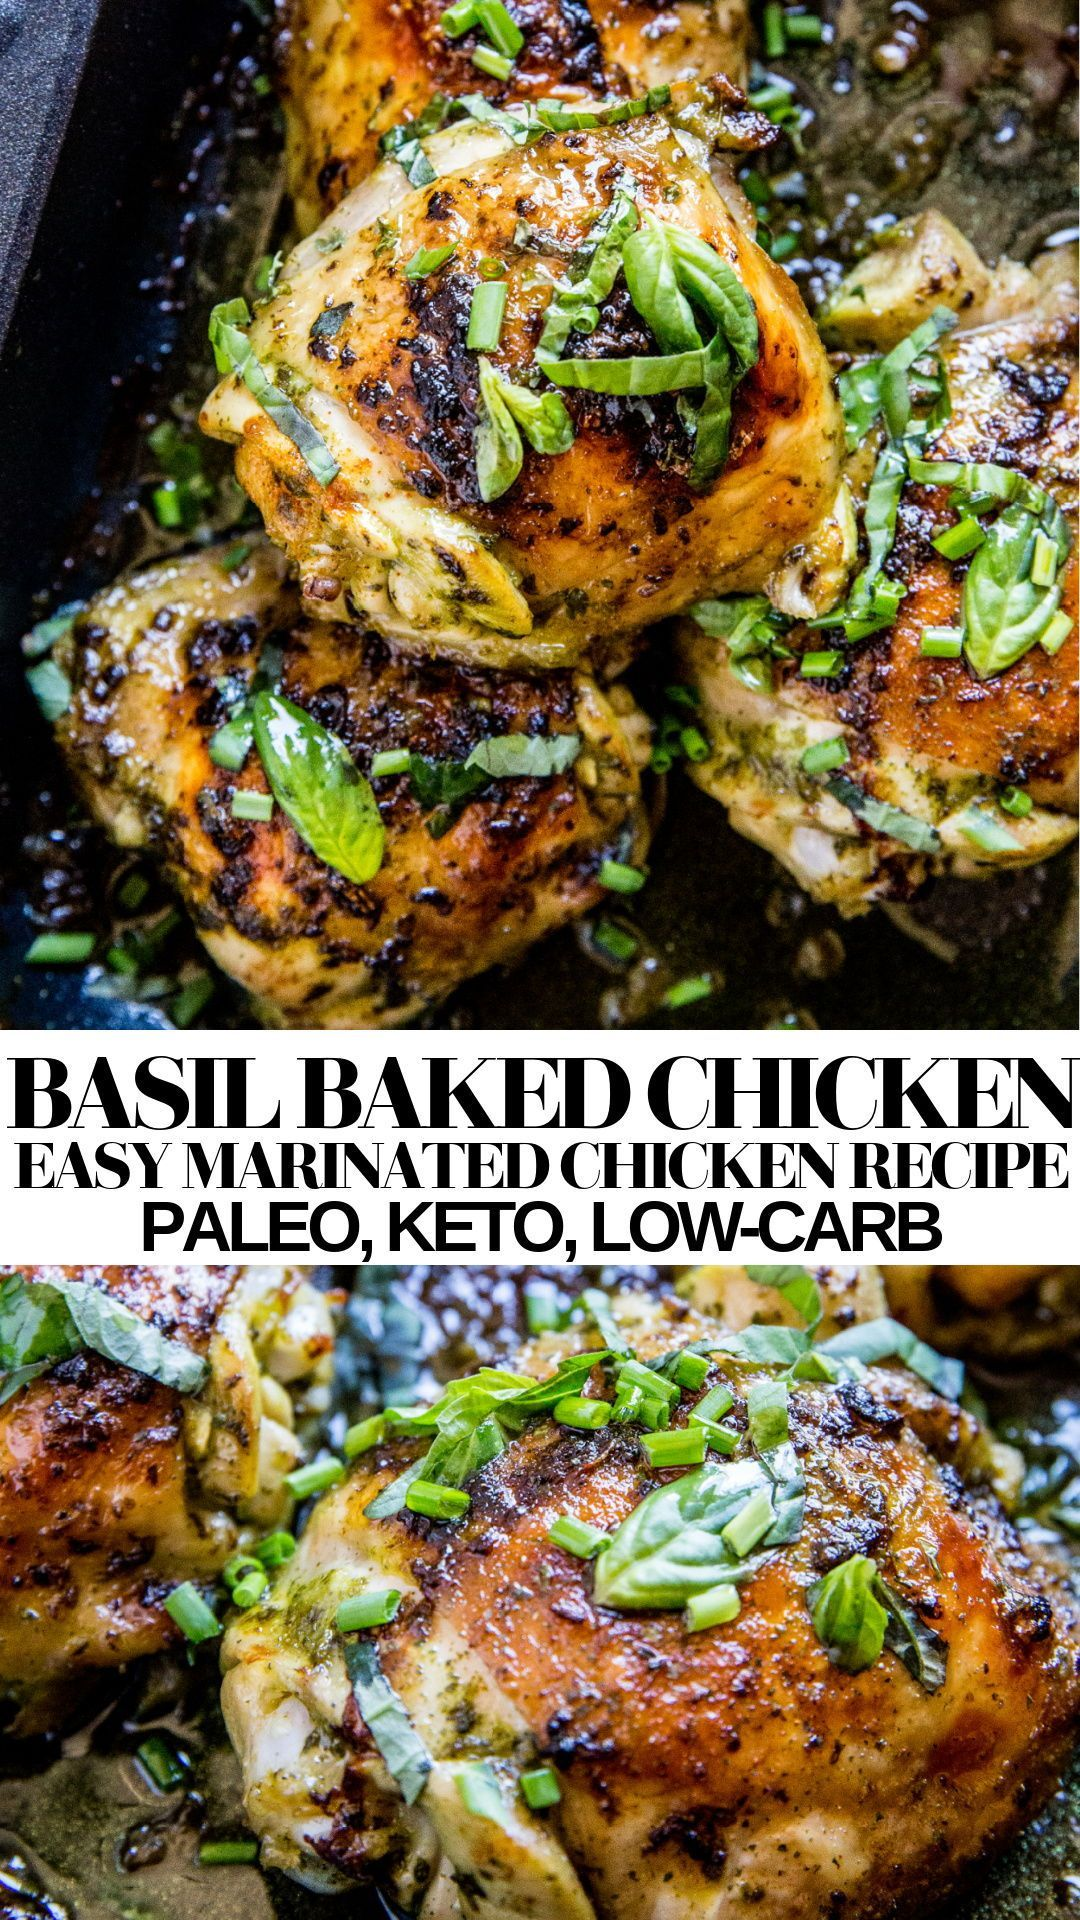 Basil Crispy Baked Chicken In 2020 Healthy Chicken Recipes Chicken Recipes Healthy Chicken Recipes Easy